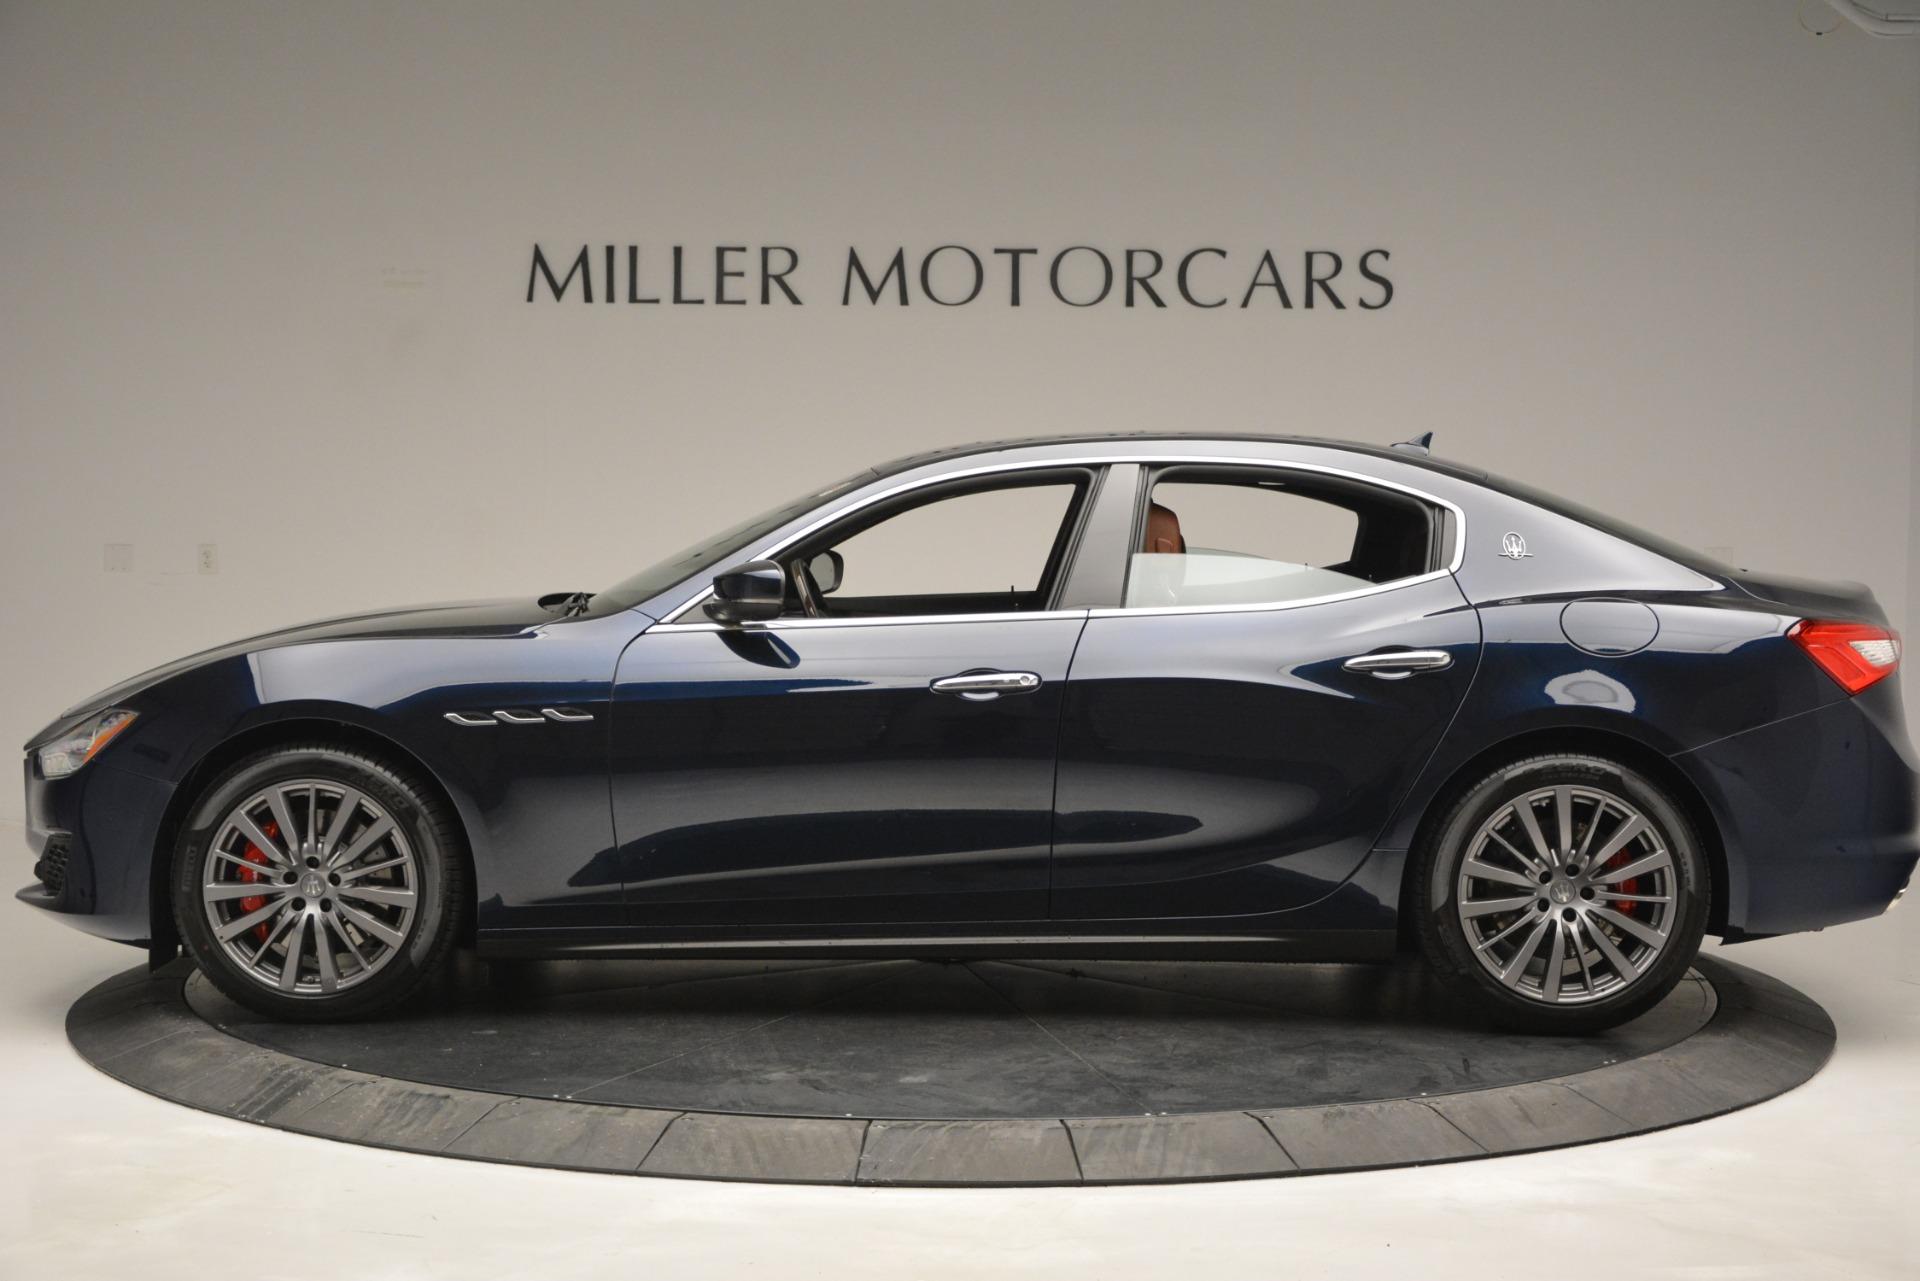 New 2019 Maserati Ghibli S Q4 For Sale In Westport, CT 2796_p3